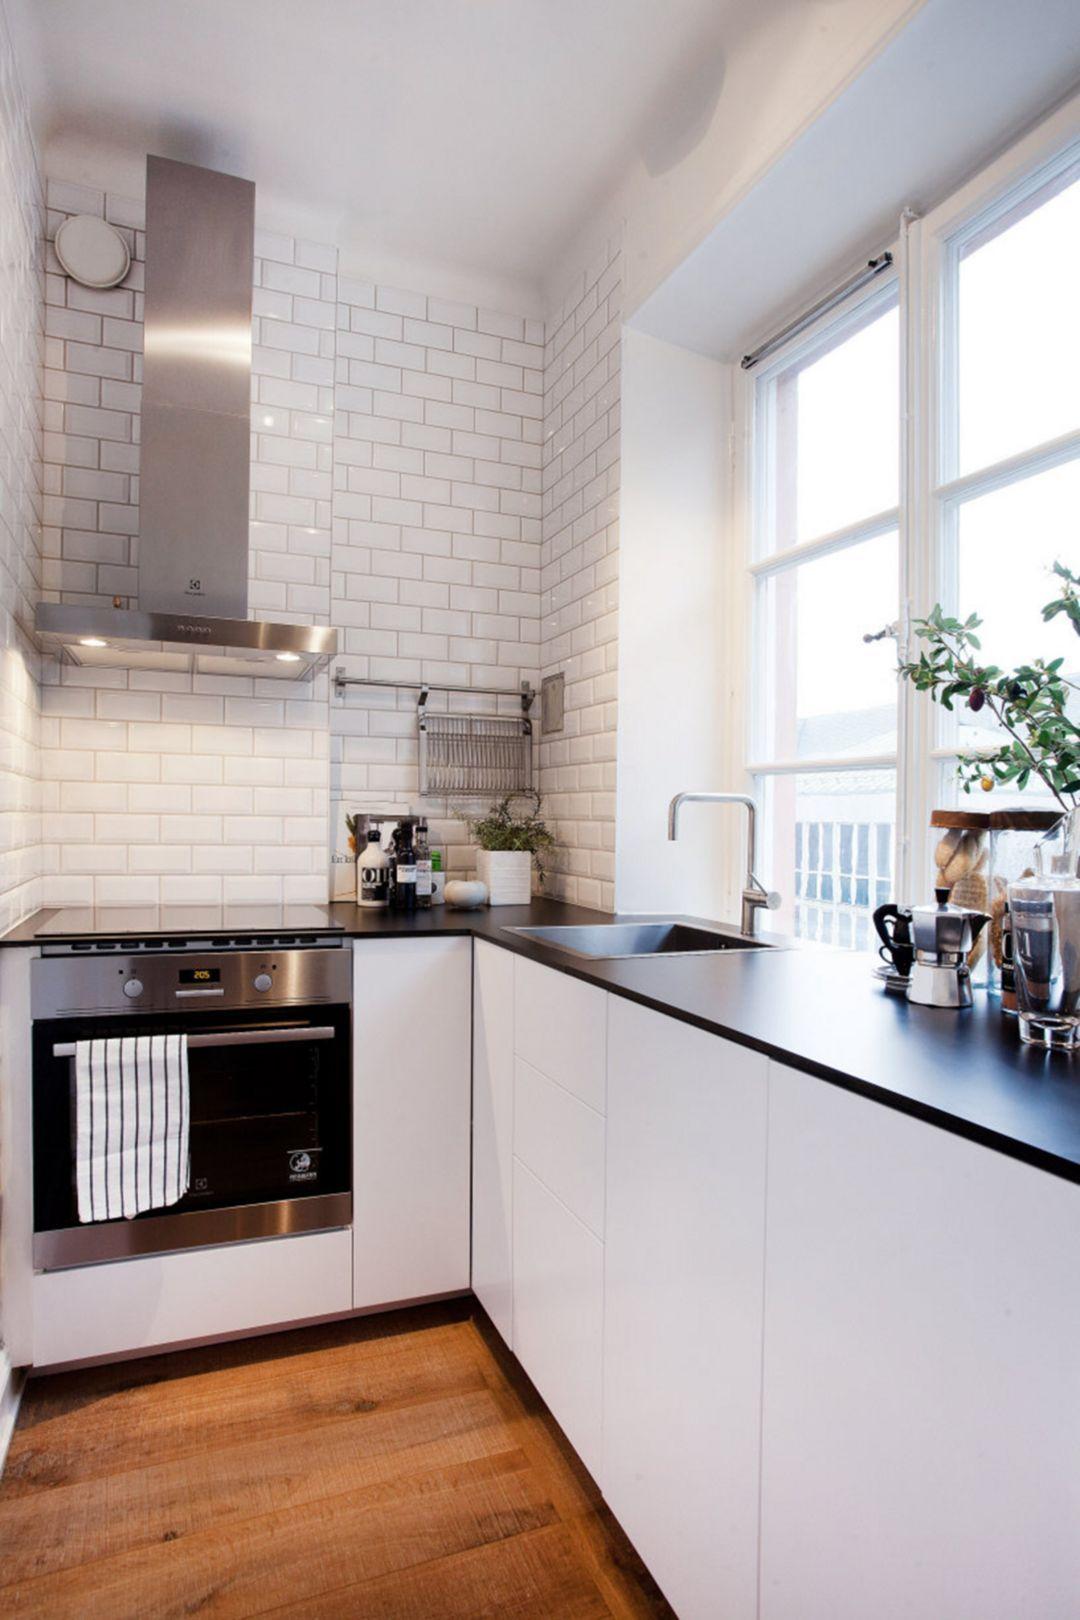 35 Outstanding Small Kitchen Studio Designs For Comfort Dexorate Kitchen Design Small Studio Apartment Kitchen Apartment Kitchen